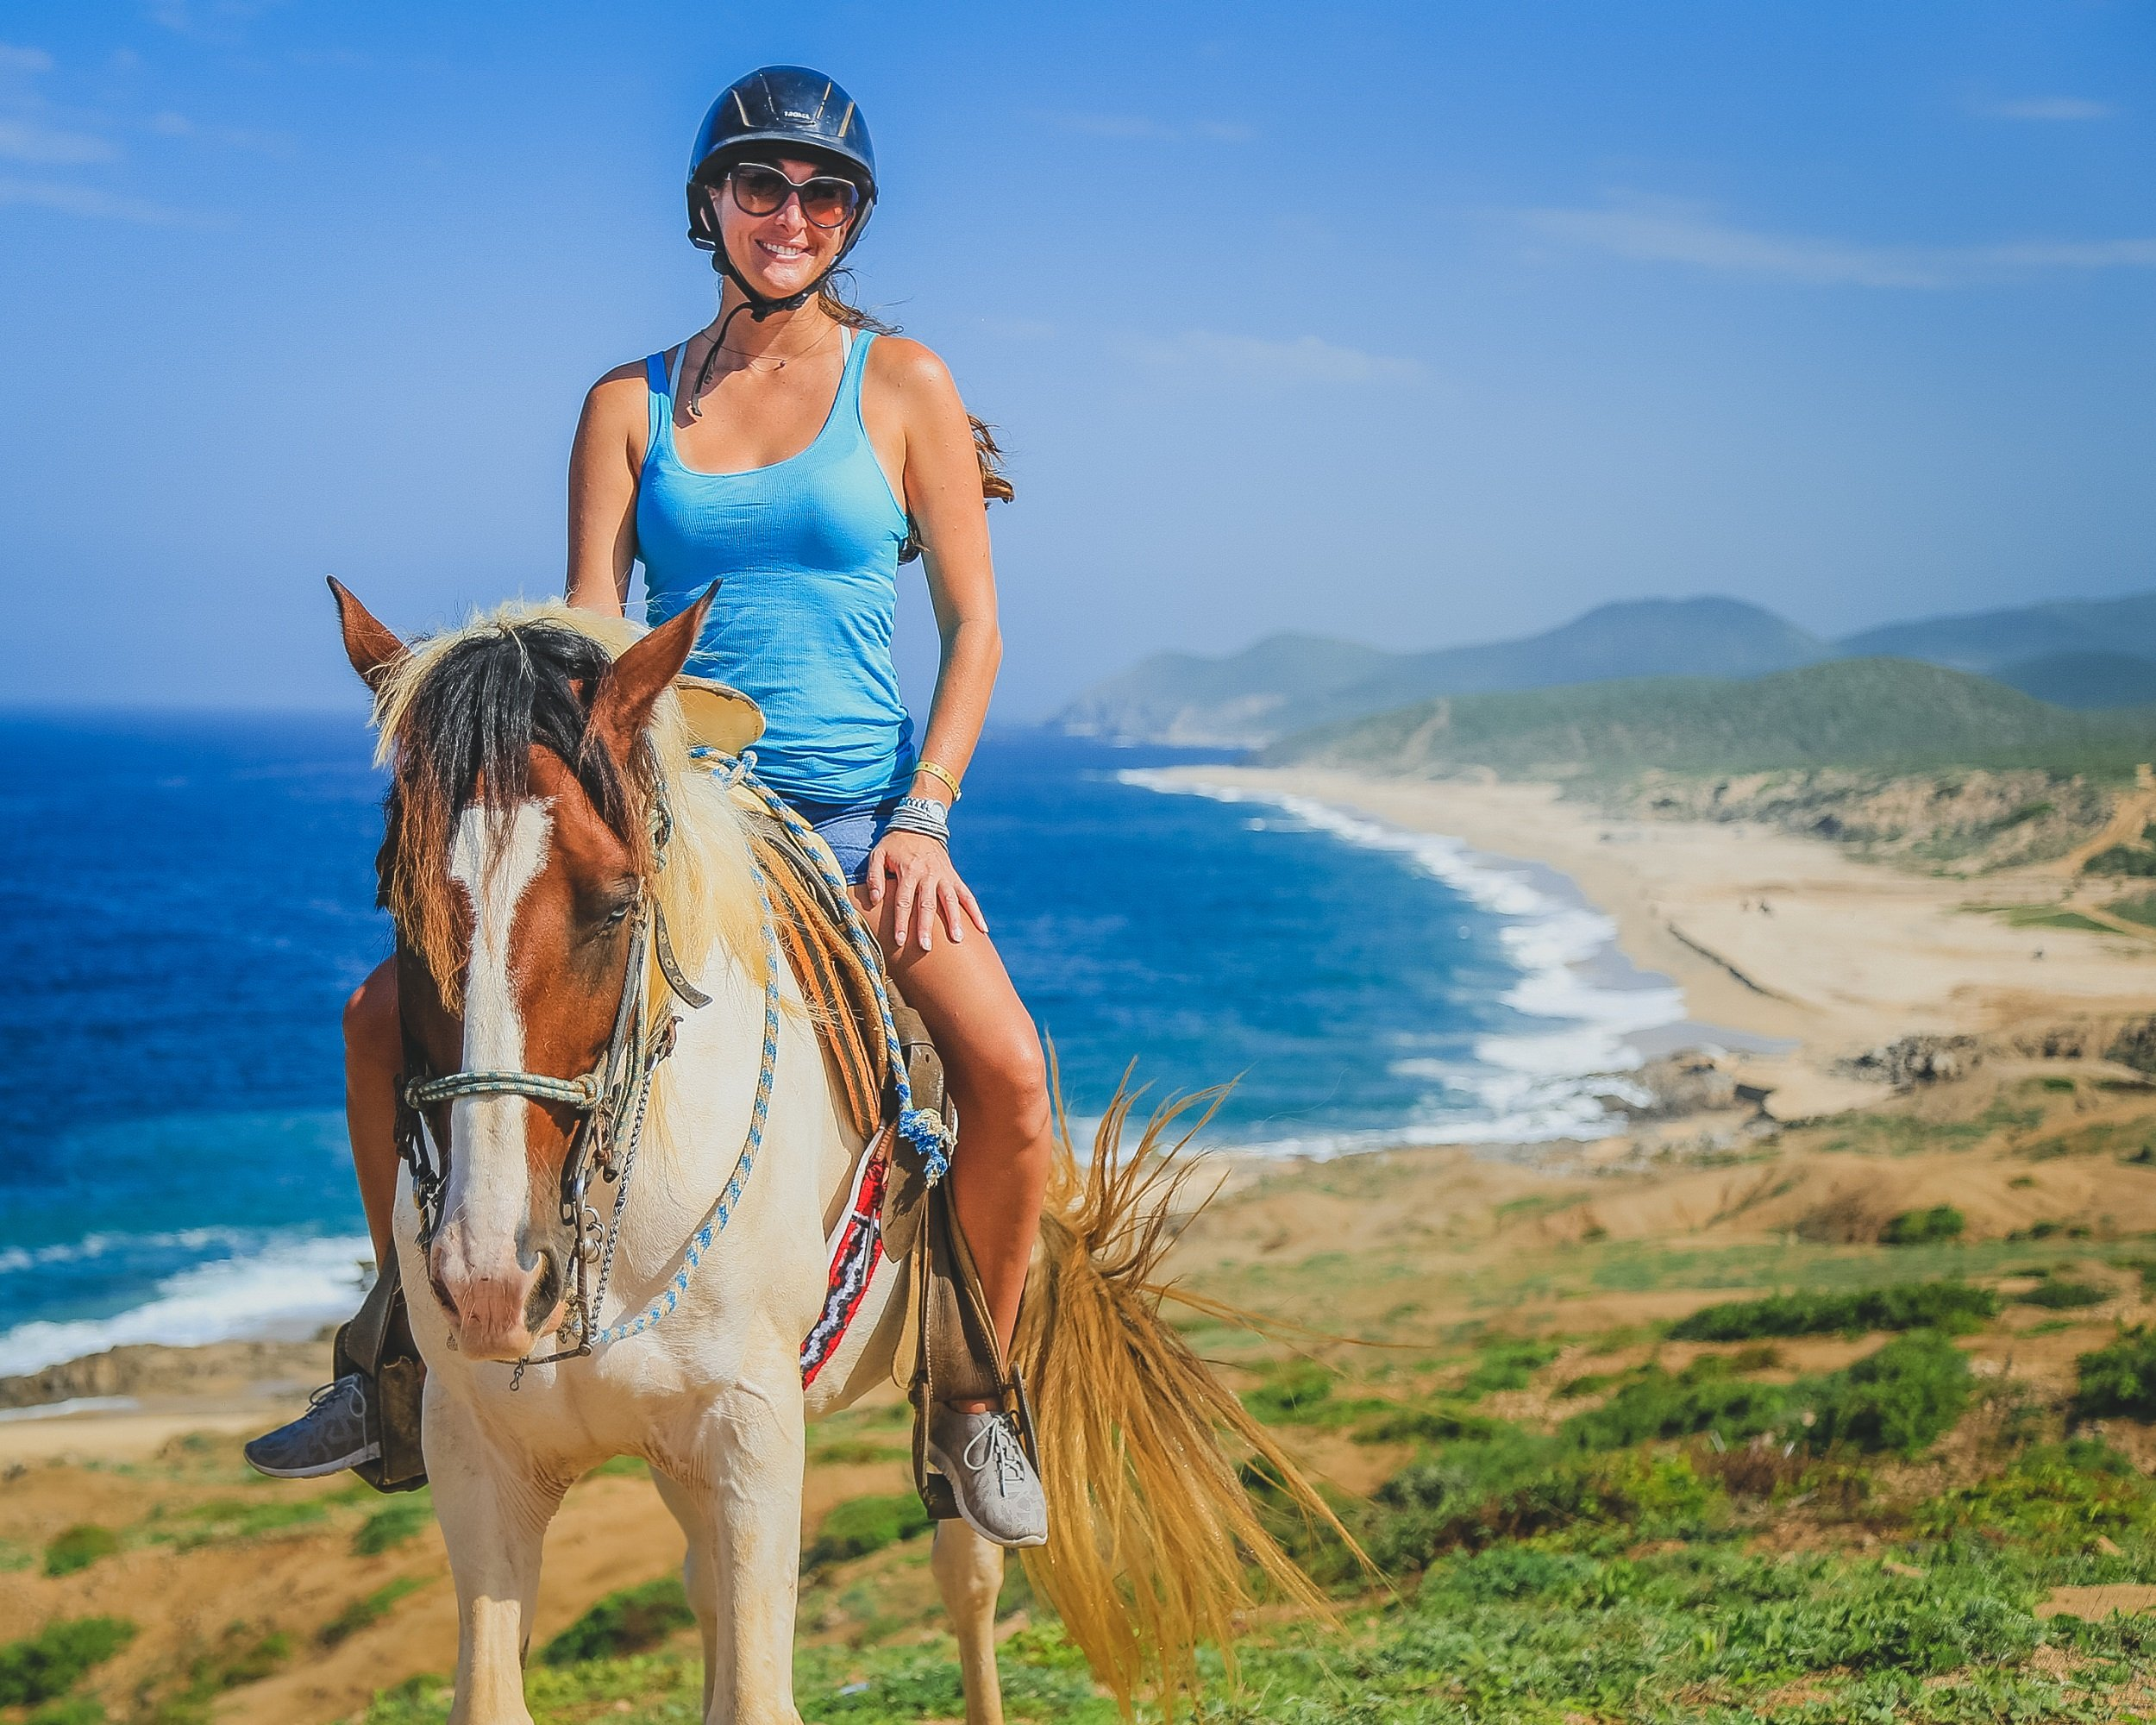 Los Cabos Beach & Desert Horseback Riding Experience For Beginners_54 (3)